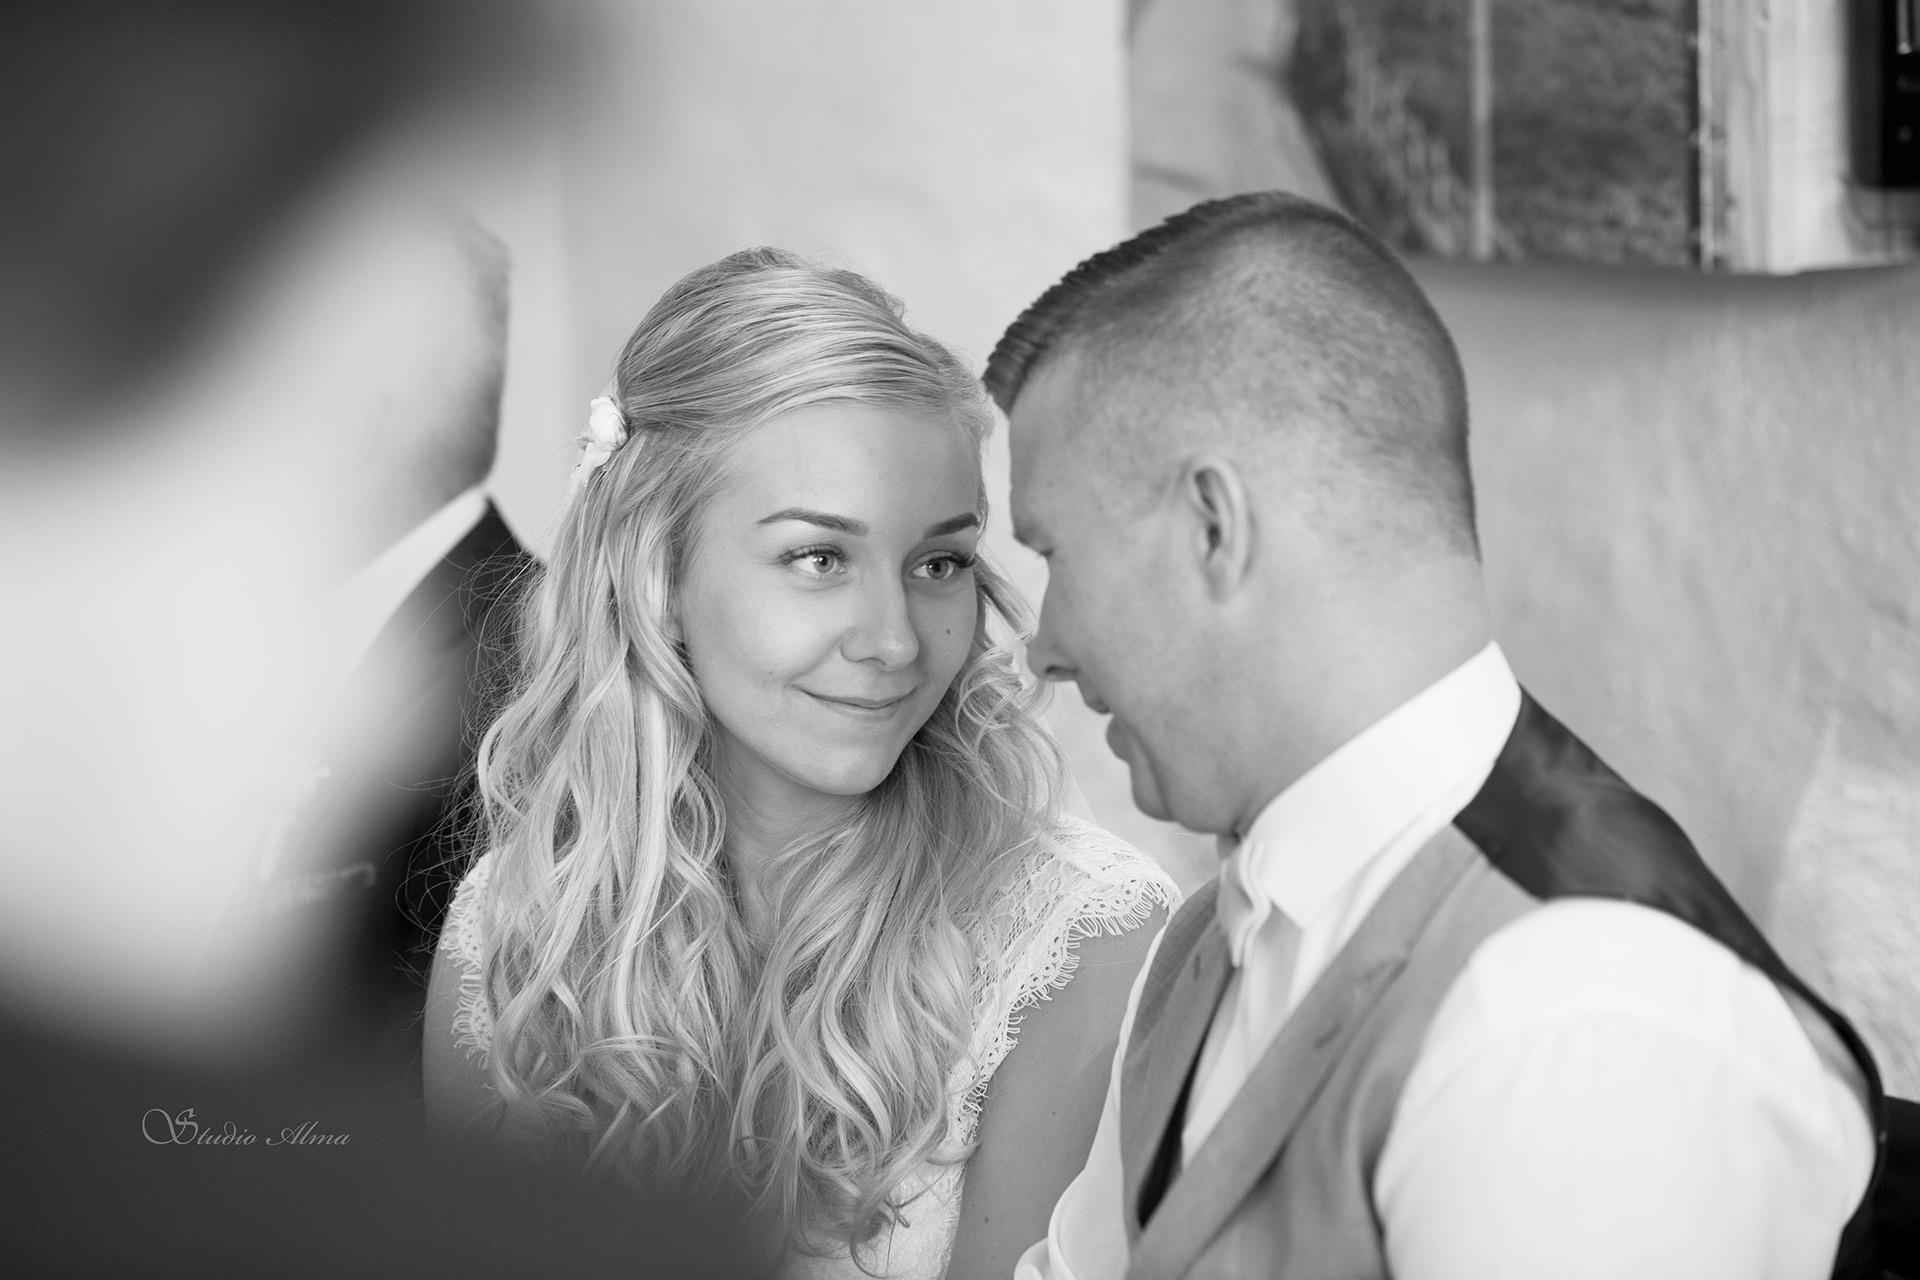 brudepar-bryllup-studioalma-wedding-fotograf